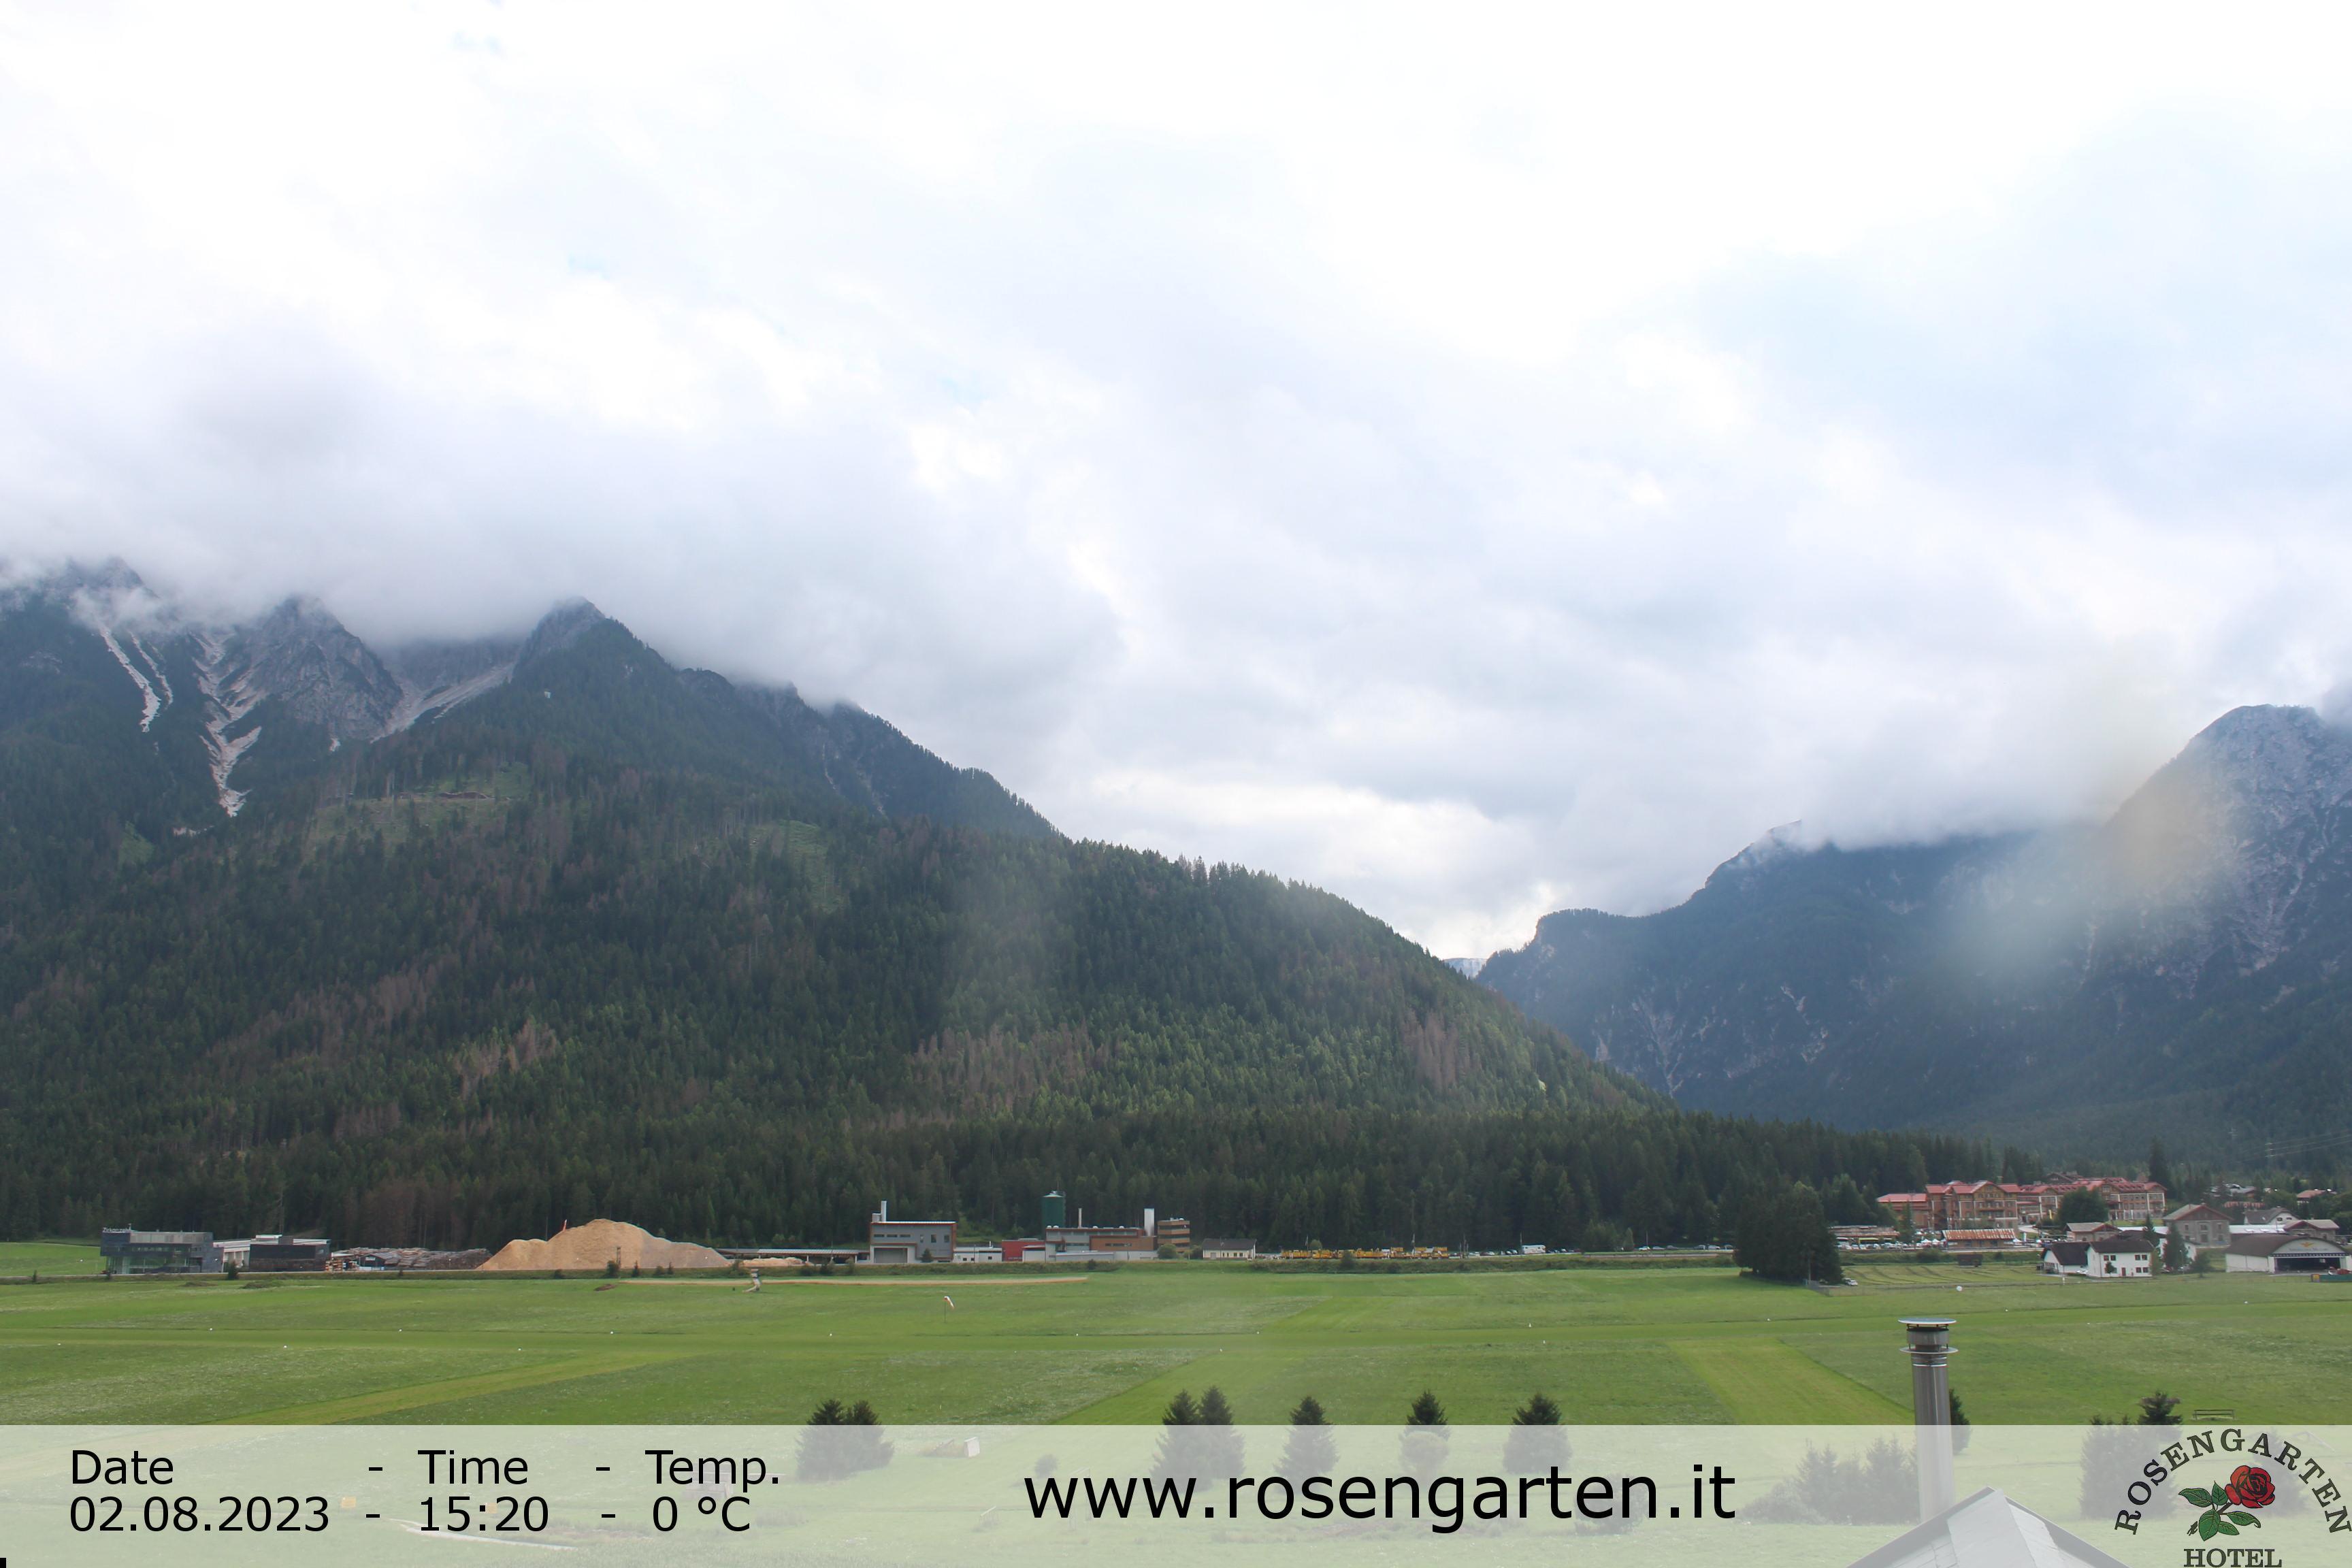 Copyright © Ballonfestival & Mediateam GmbH/Srl Innichen - San Candido